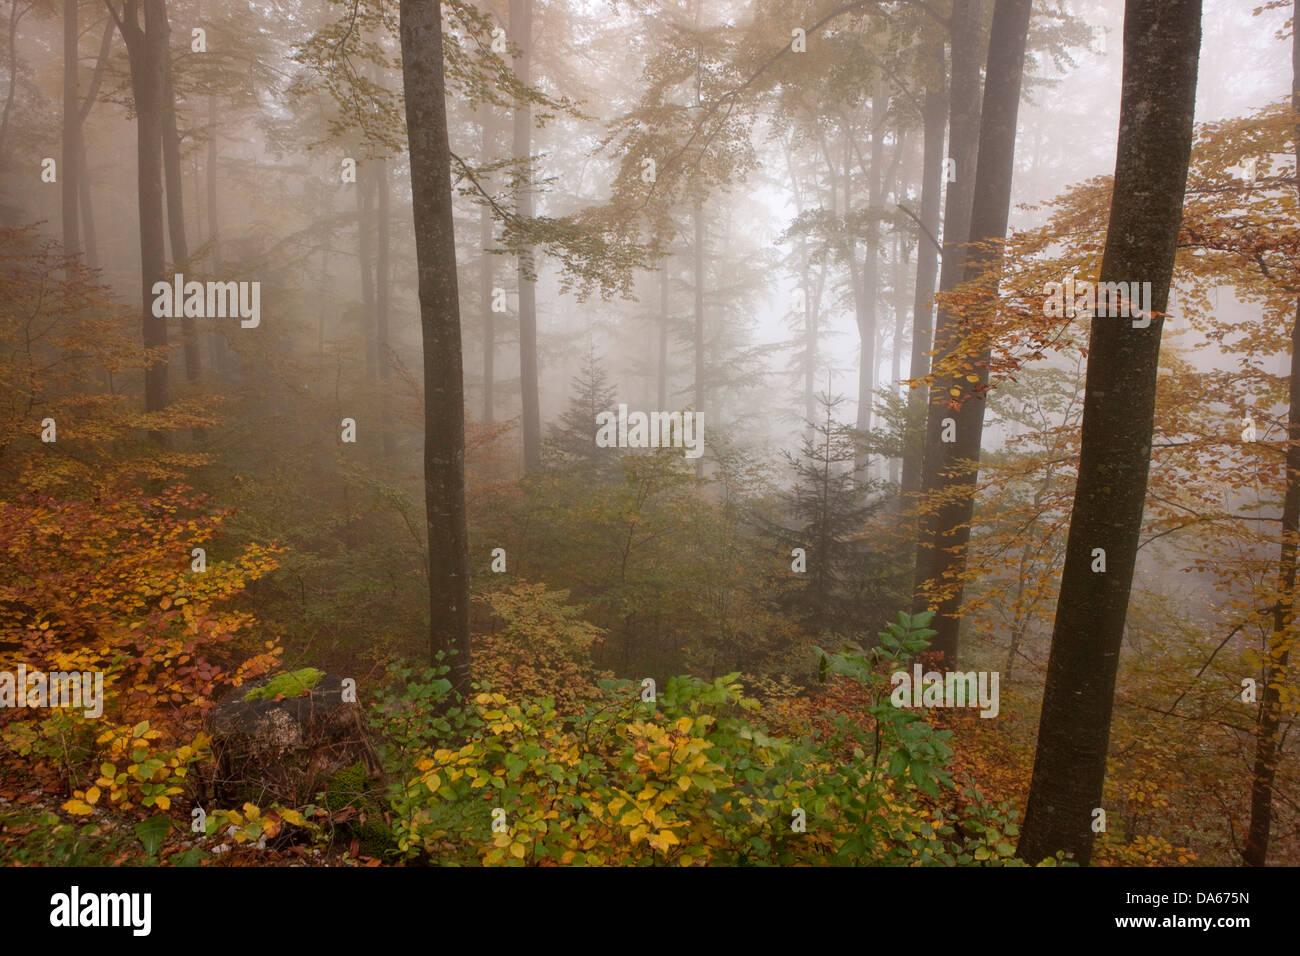 Bois, Forêt, Areuseschlucht, Jura, le brouillard, la mer de brouillard, brouillard, de ravin, canyon, bois, Photo Stock